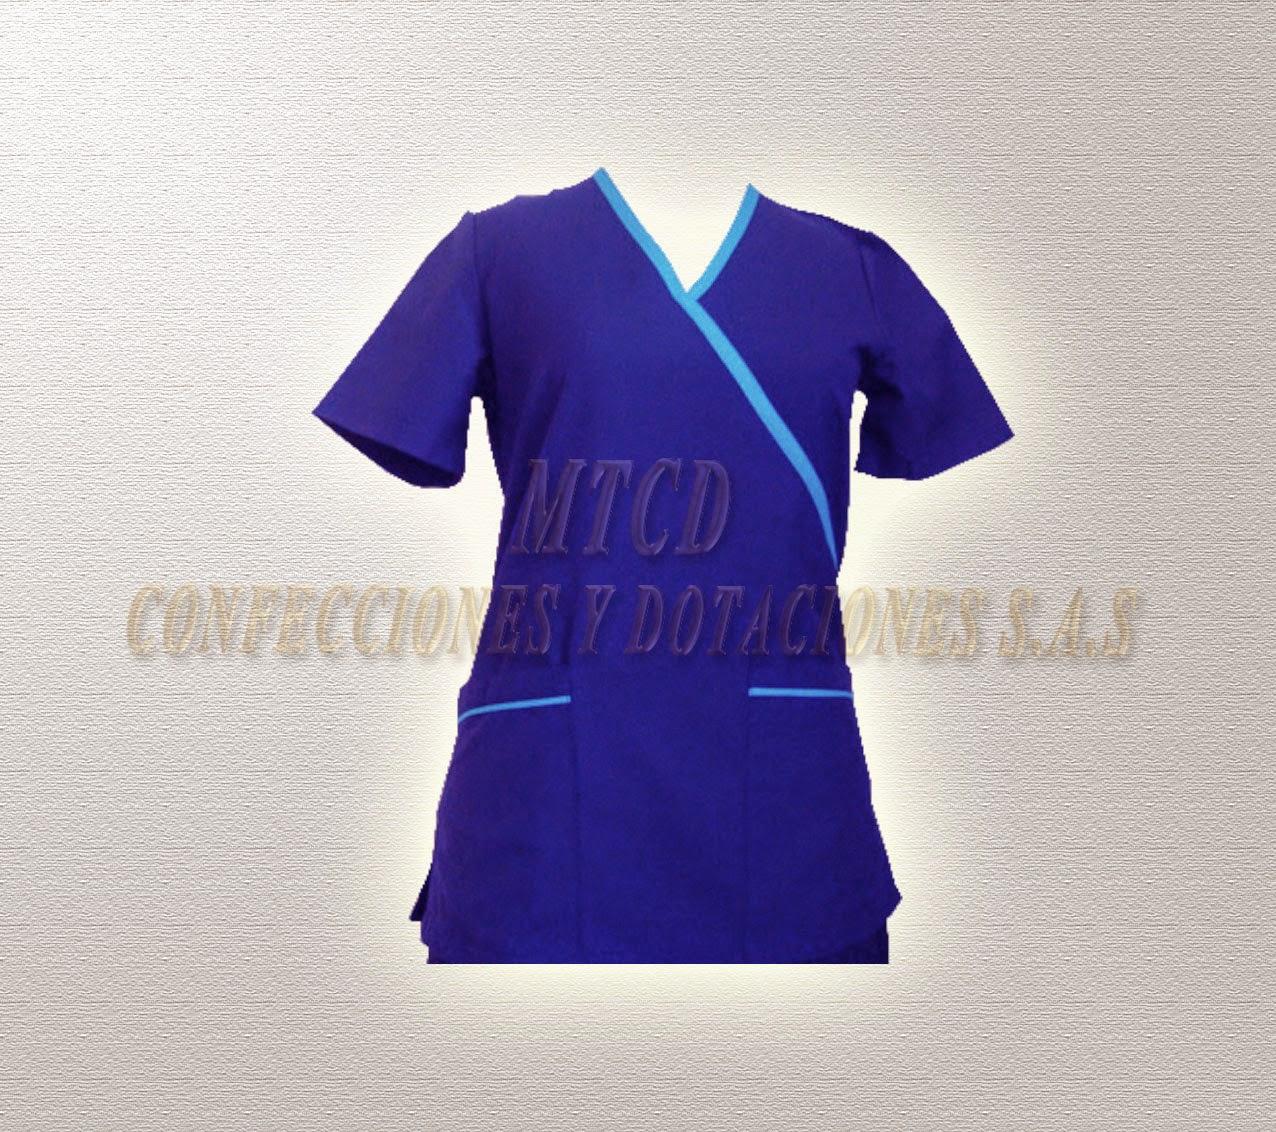 Bata de uniforme cruzado dotacion